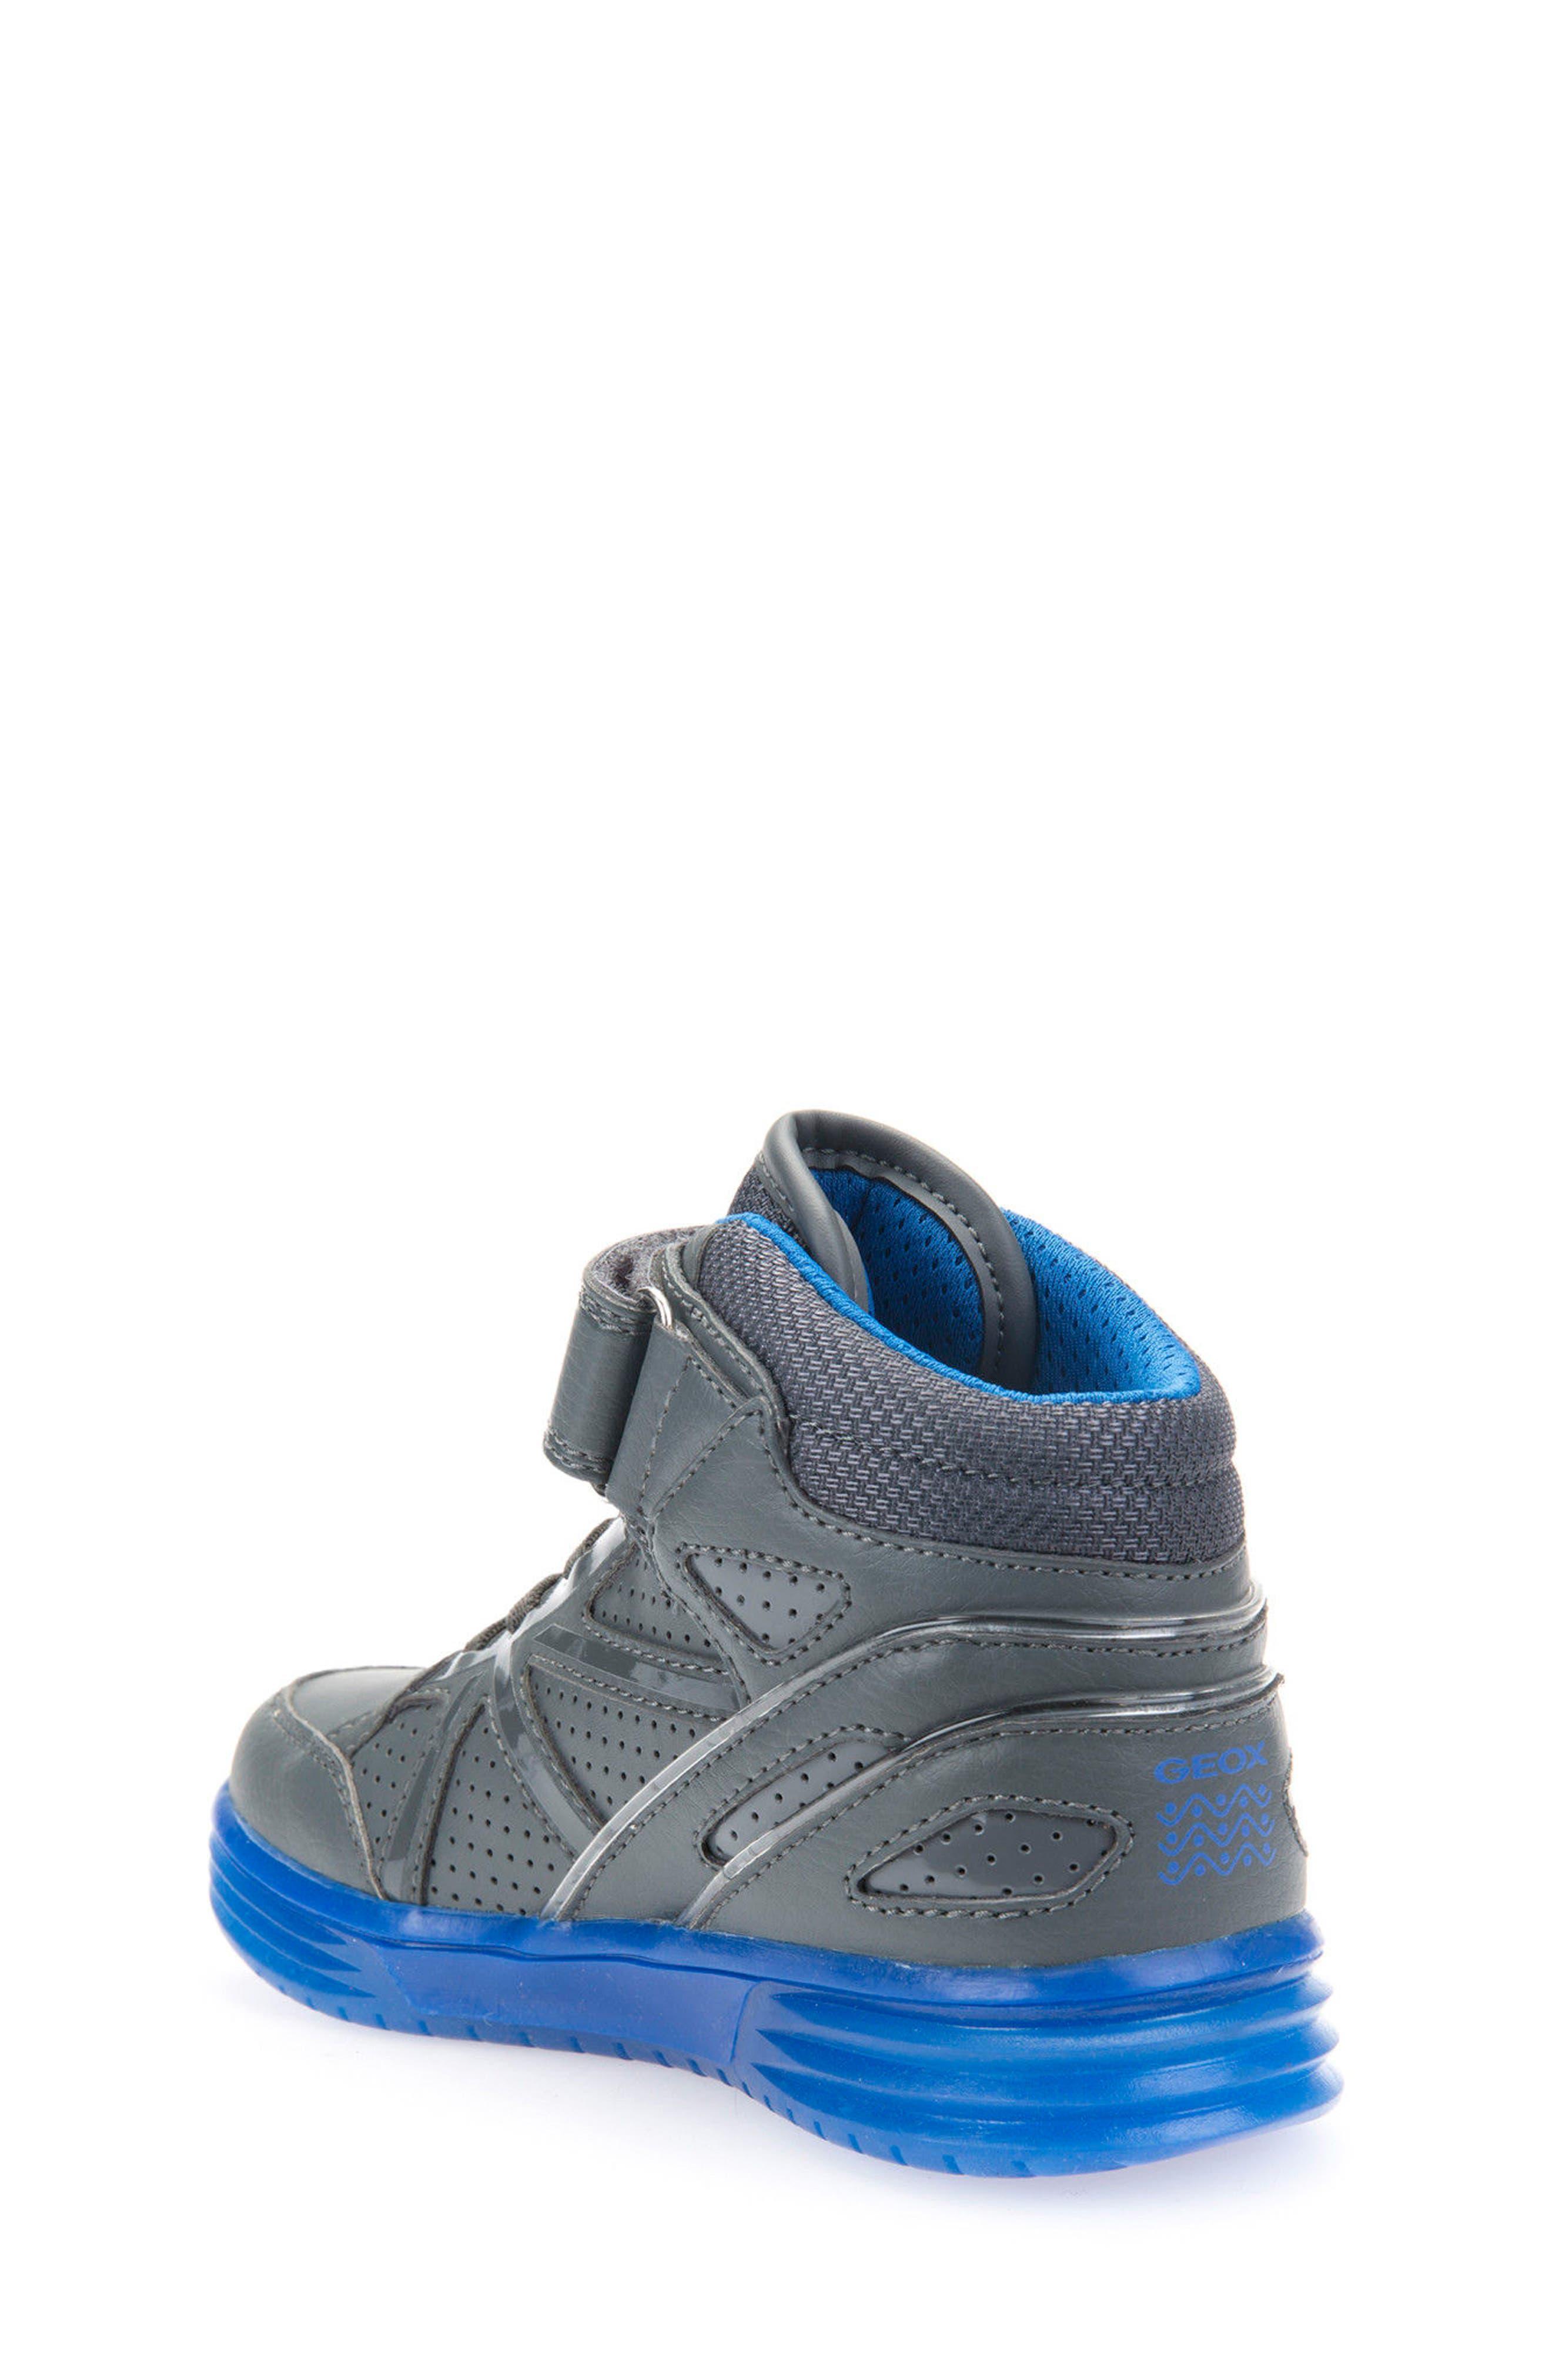 Argonat High Top Sneaker,                             Alternate thumbnail 2, color,                             Dark Grey/ Royal